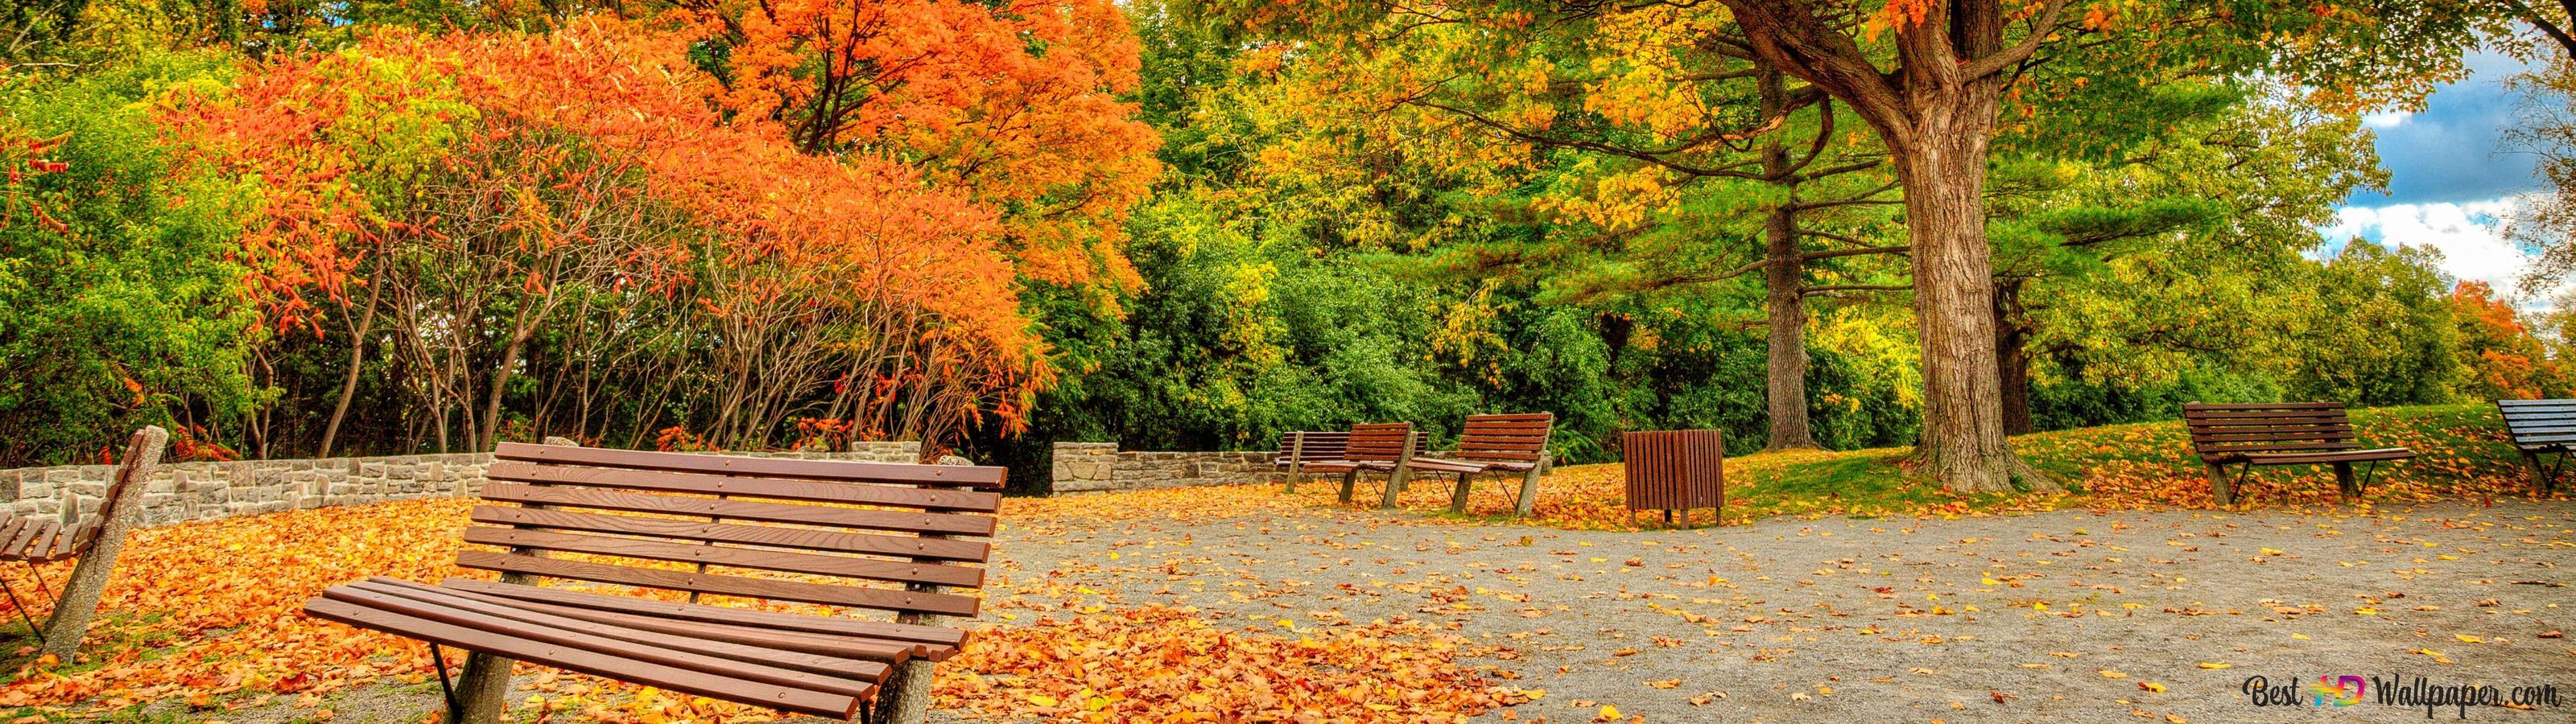 Bench In Autumn Park Hd Wallpaper Download